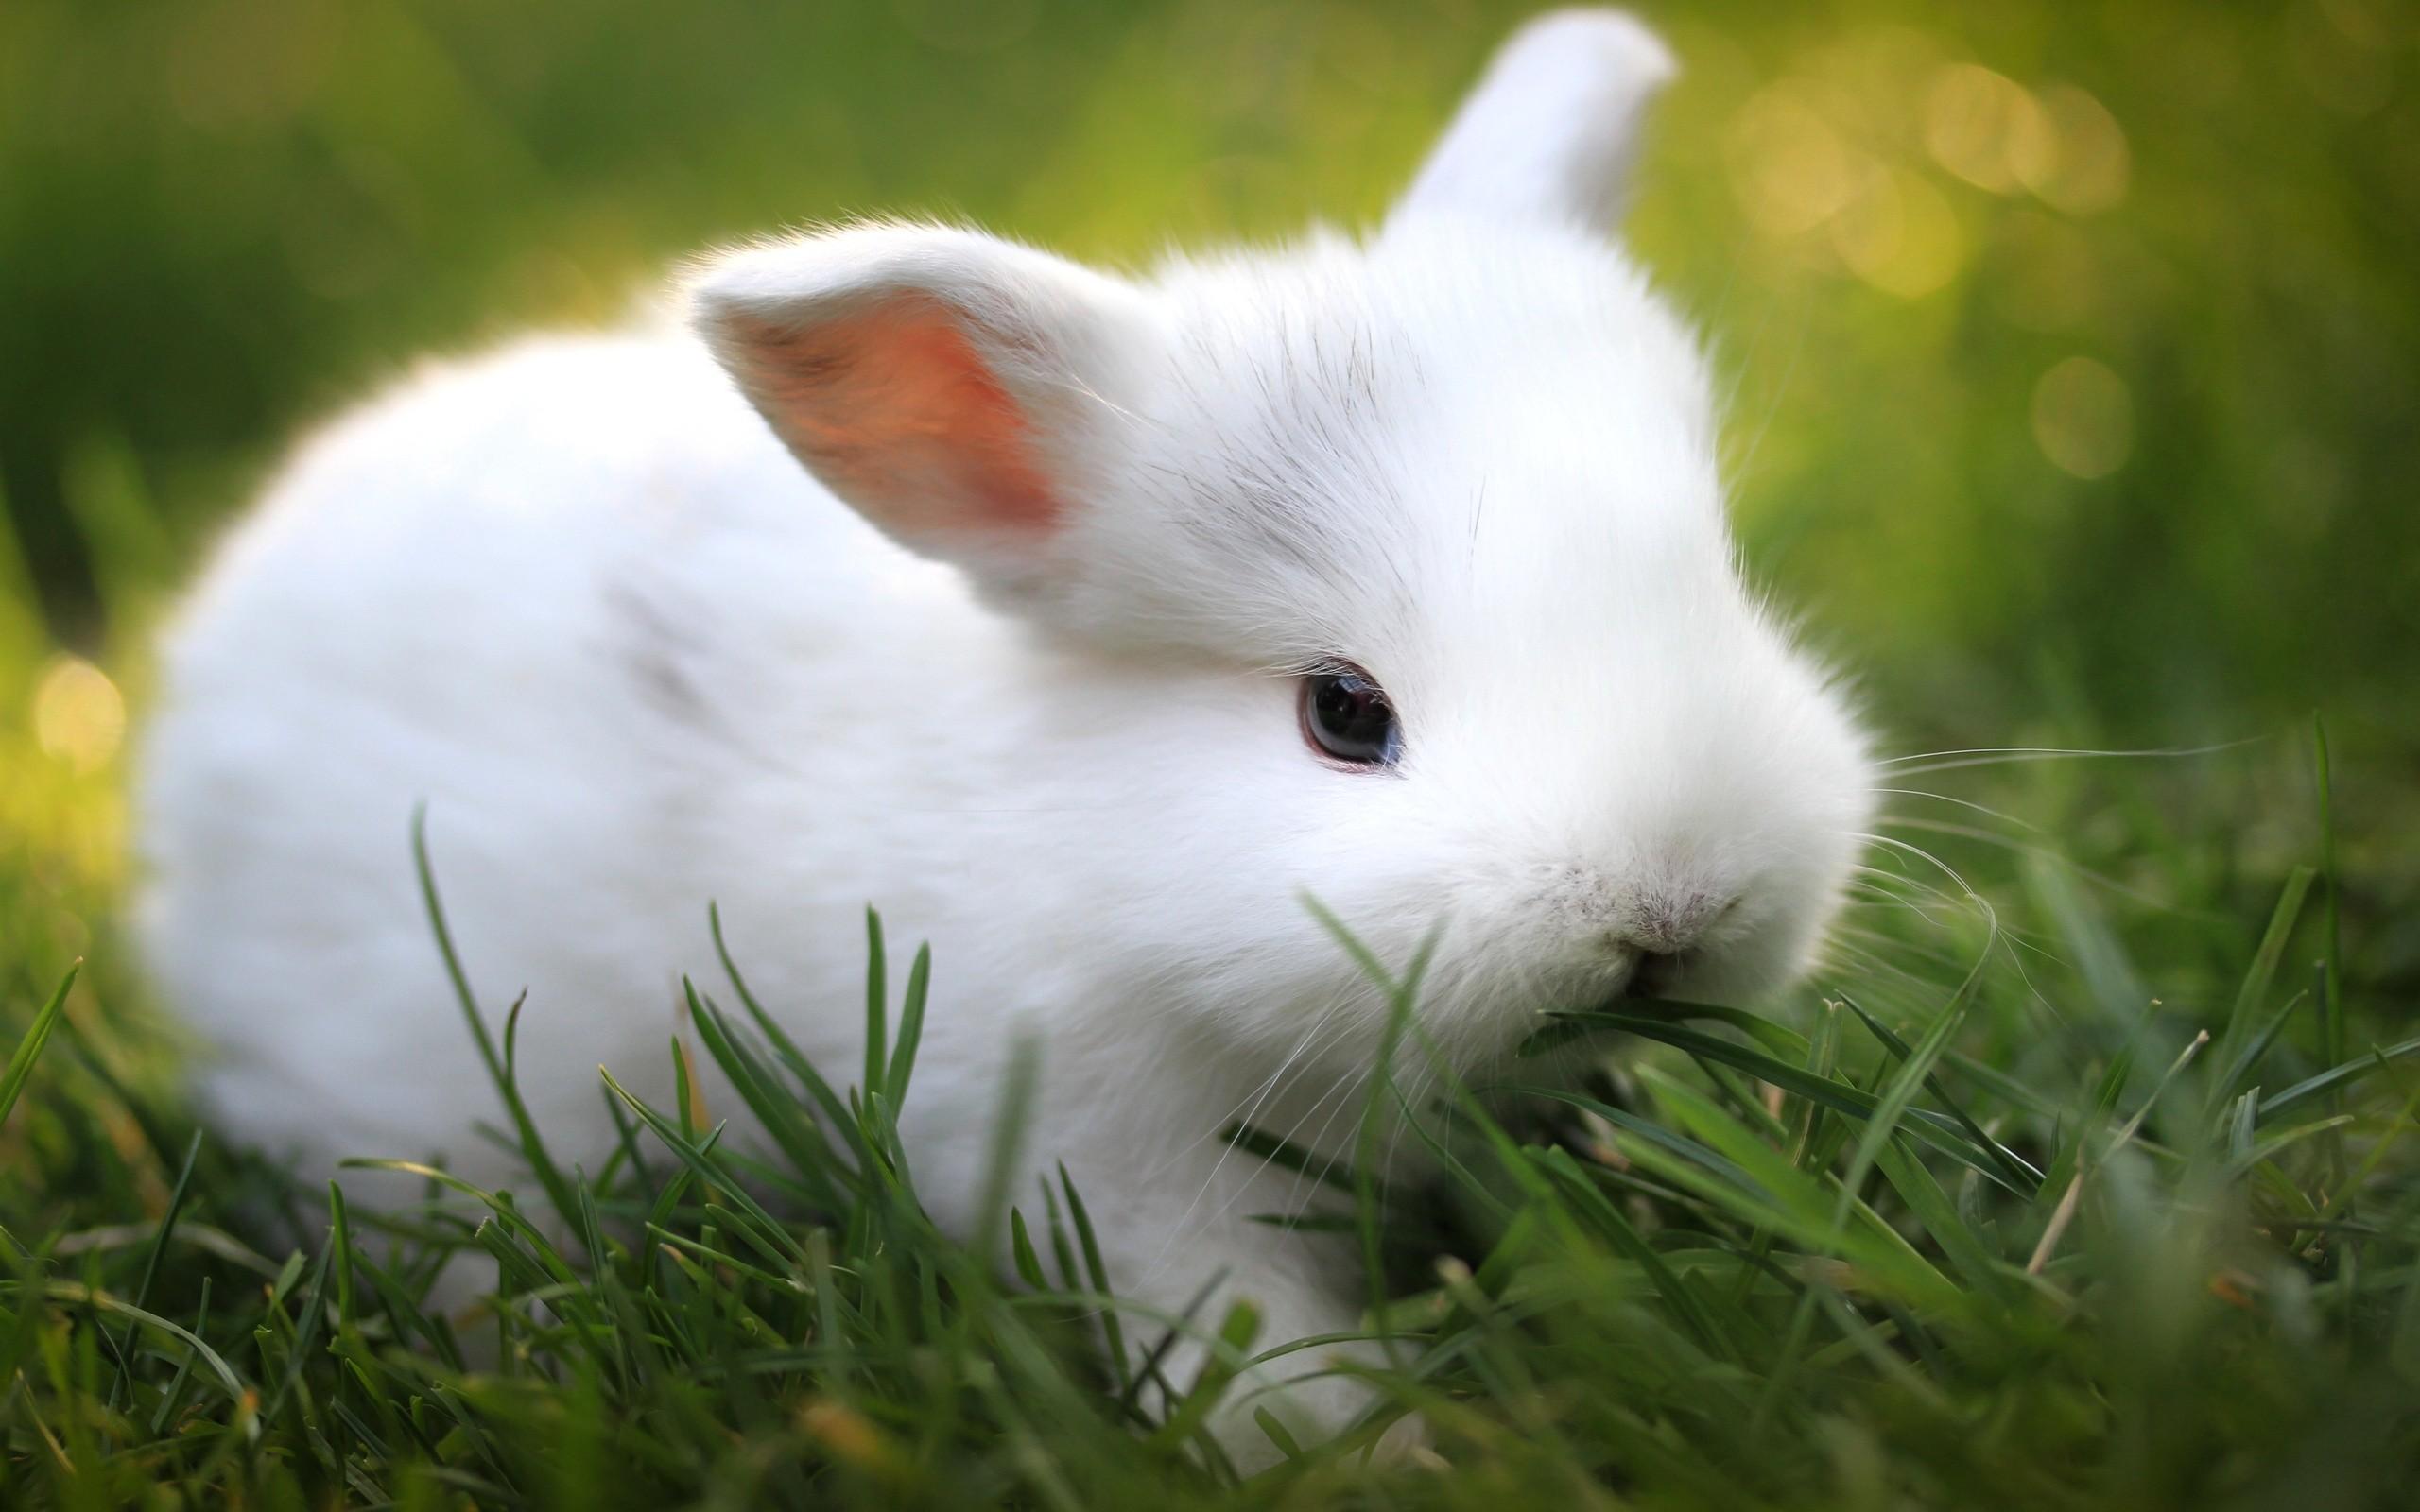 Cute little White Rabbit HD Wallpaper